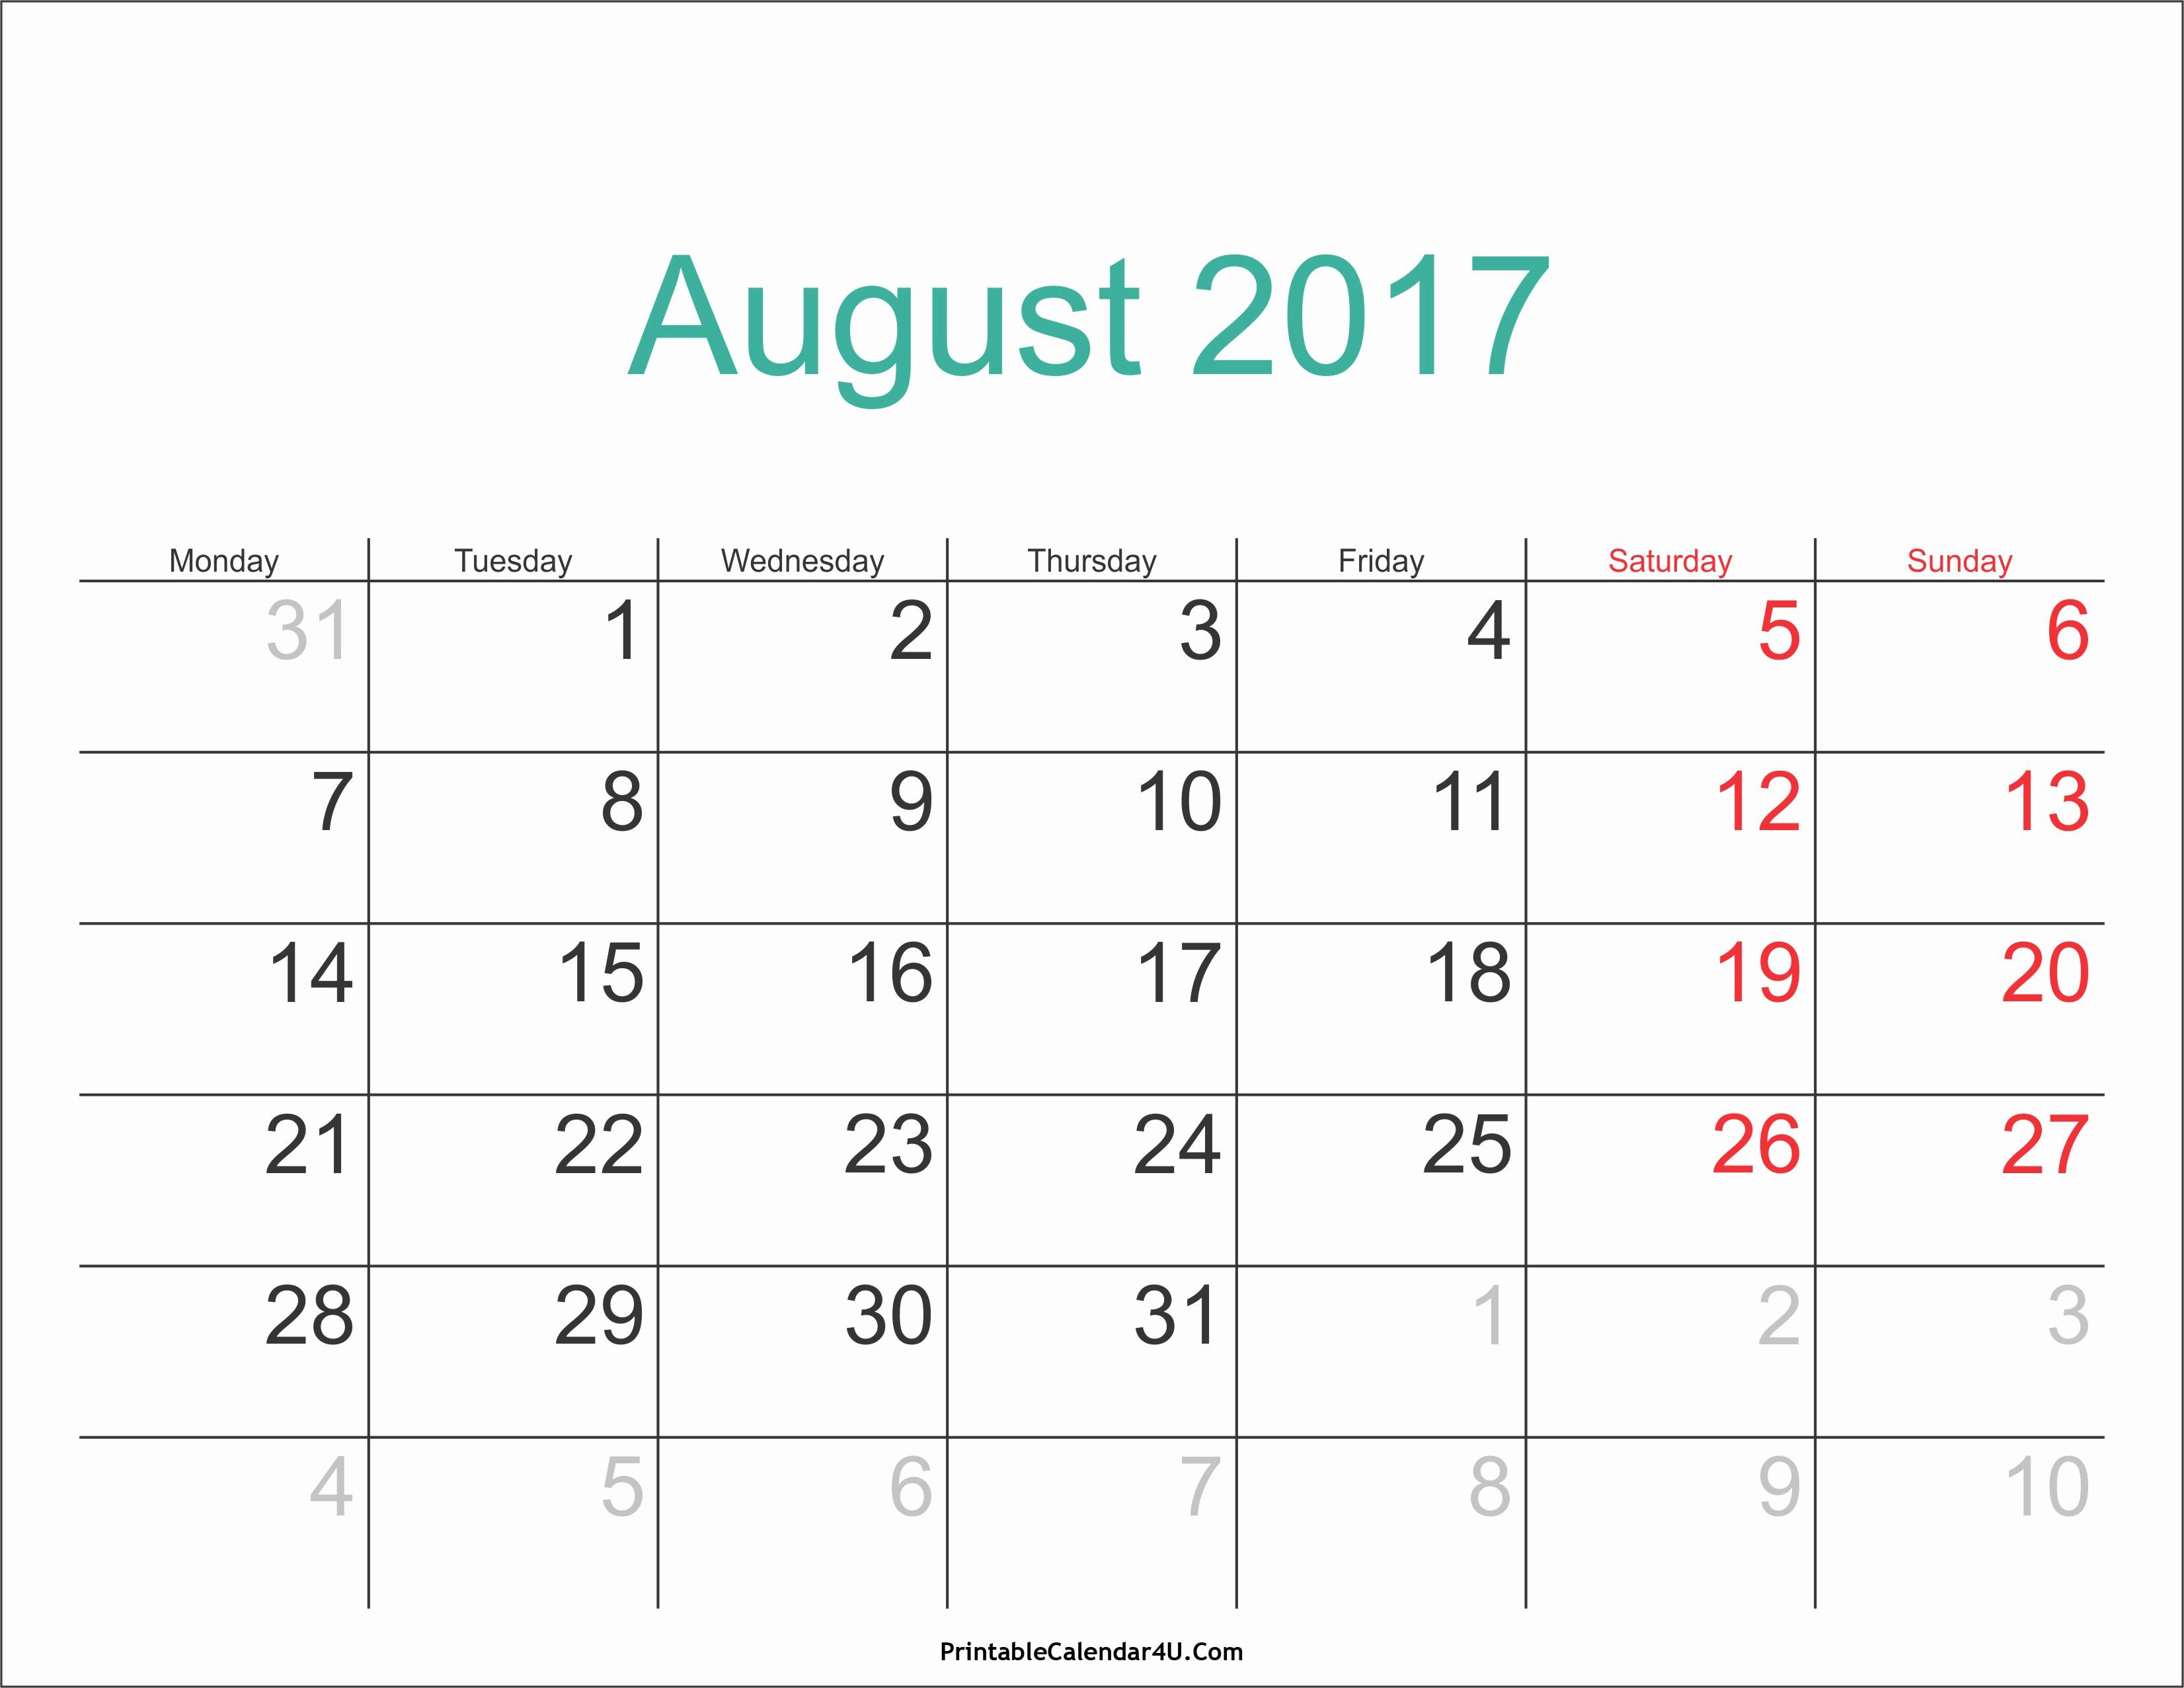 2017 Calendar with Holidays Template Inspirational August 2017 Calendar with Holidays